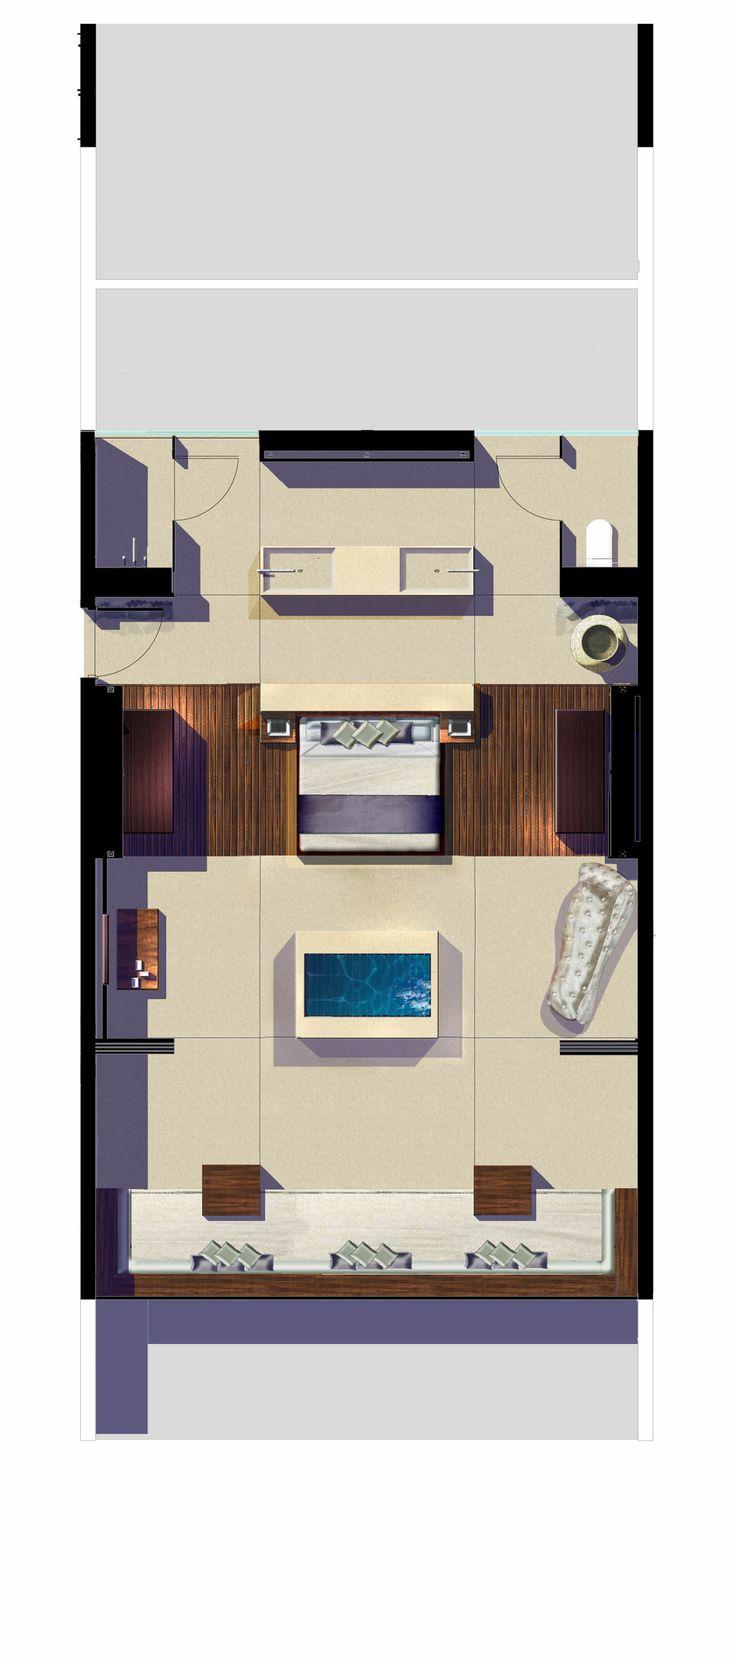 Hilton Hotel, Fiji Suite, Top Floor concept plan